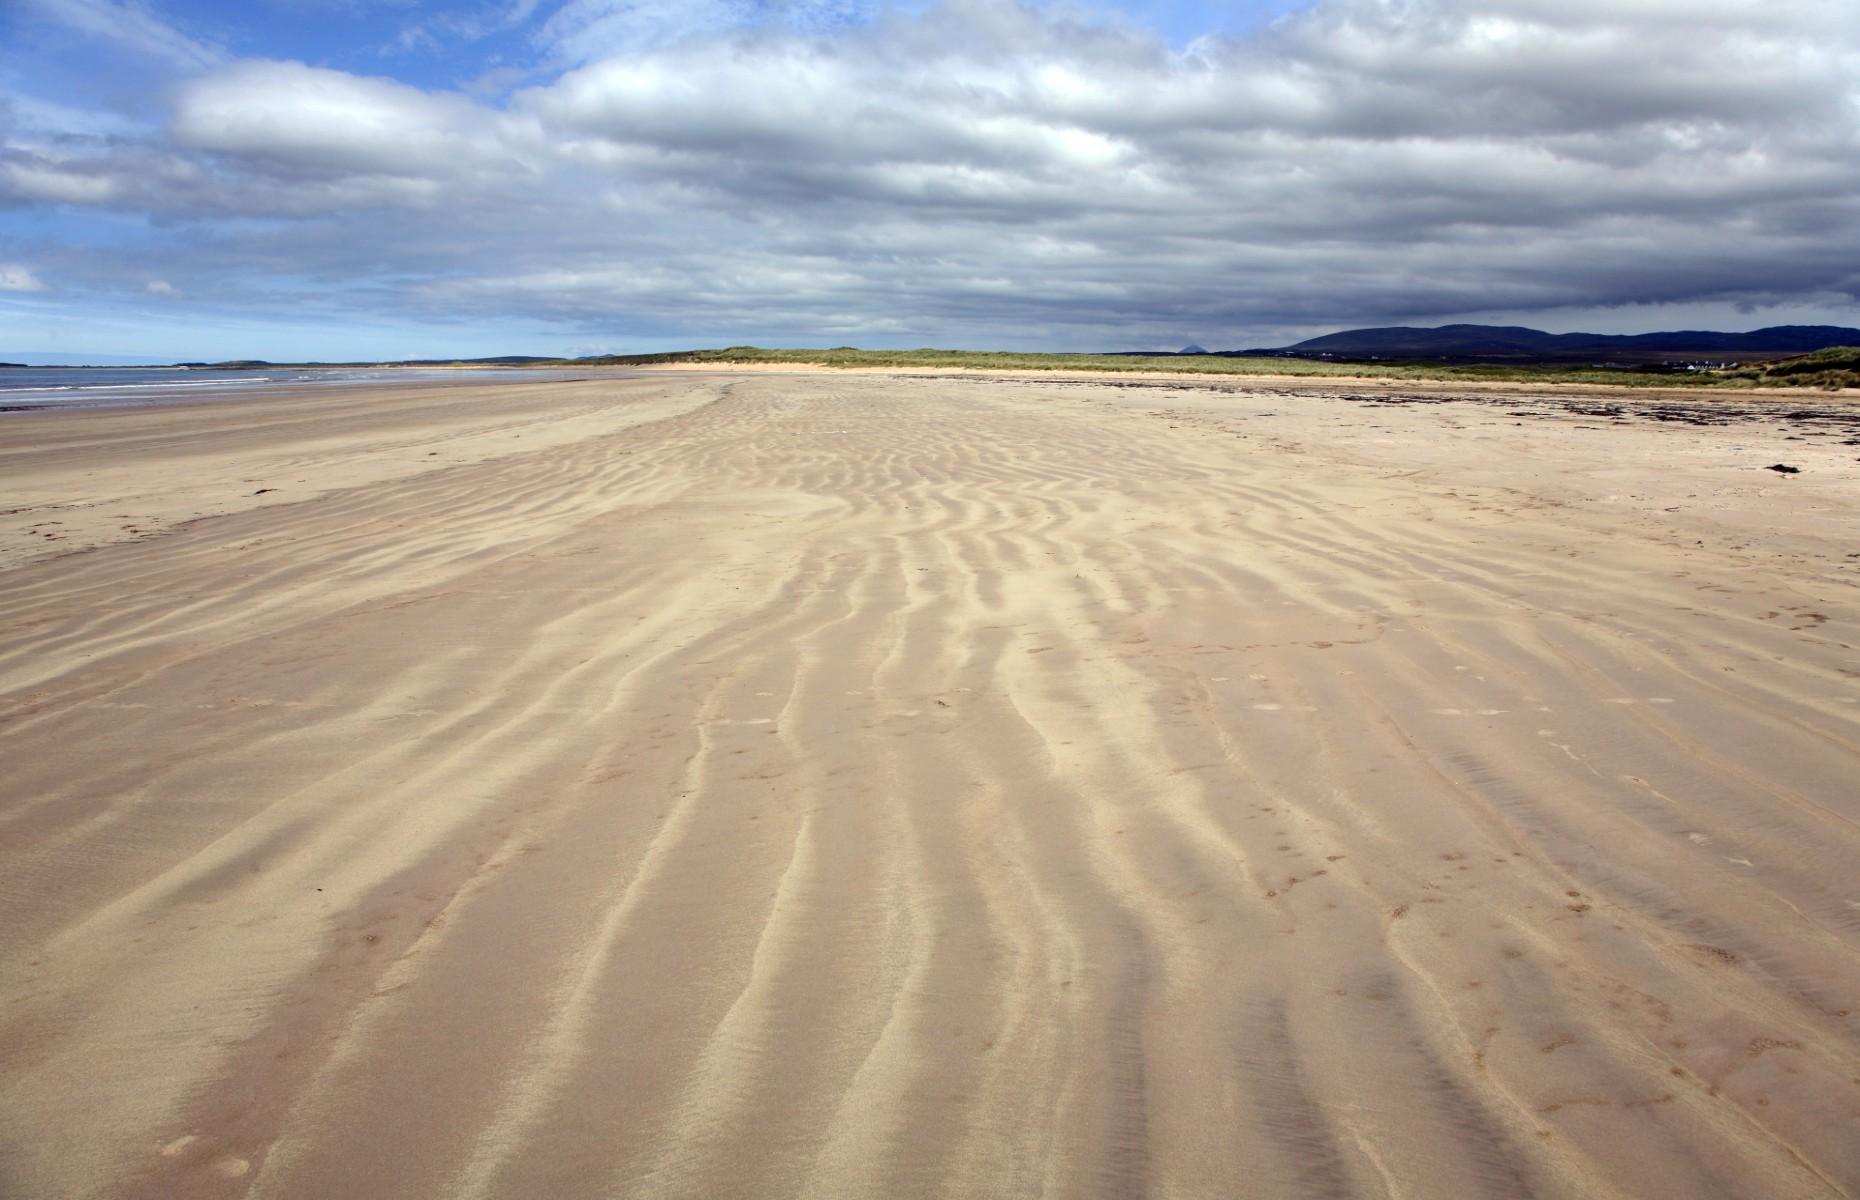 The sands at Laggan Bay (Image: david harding/Shutterstock)